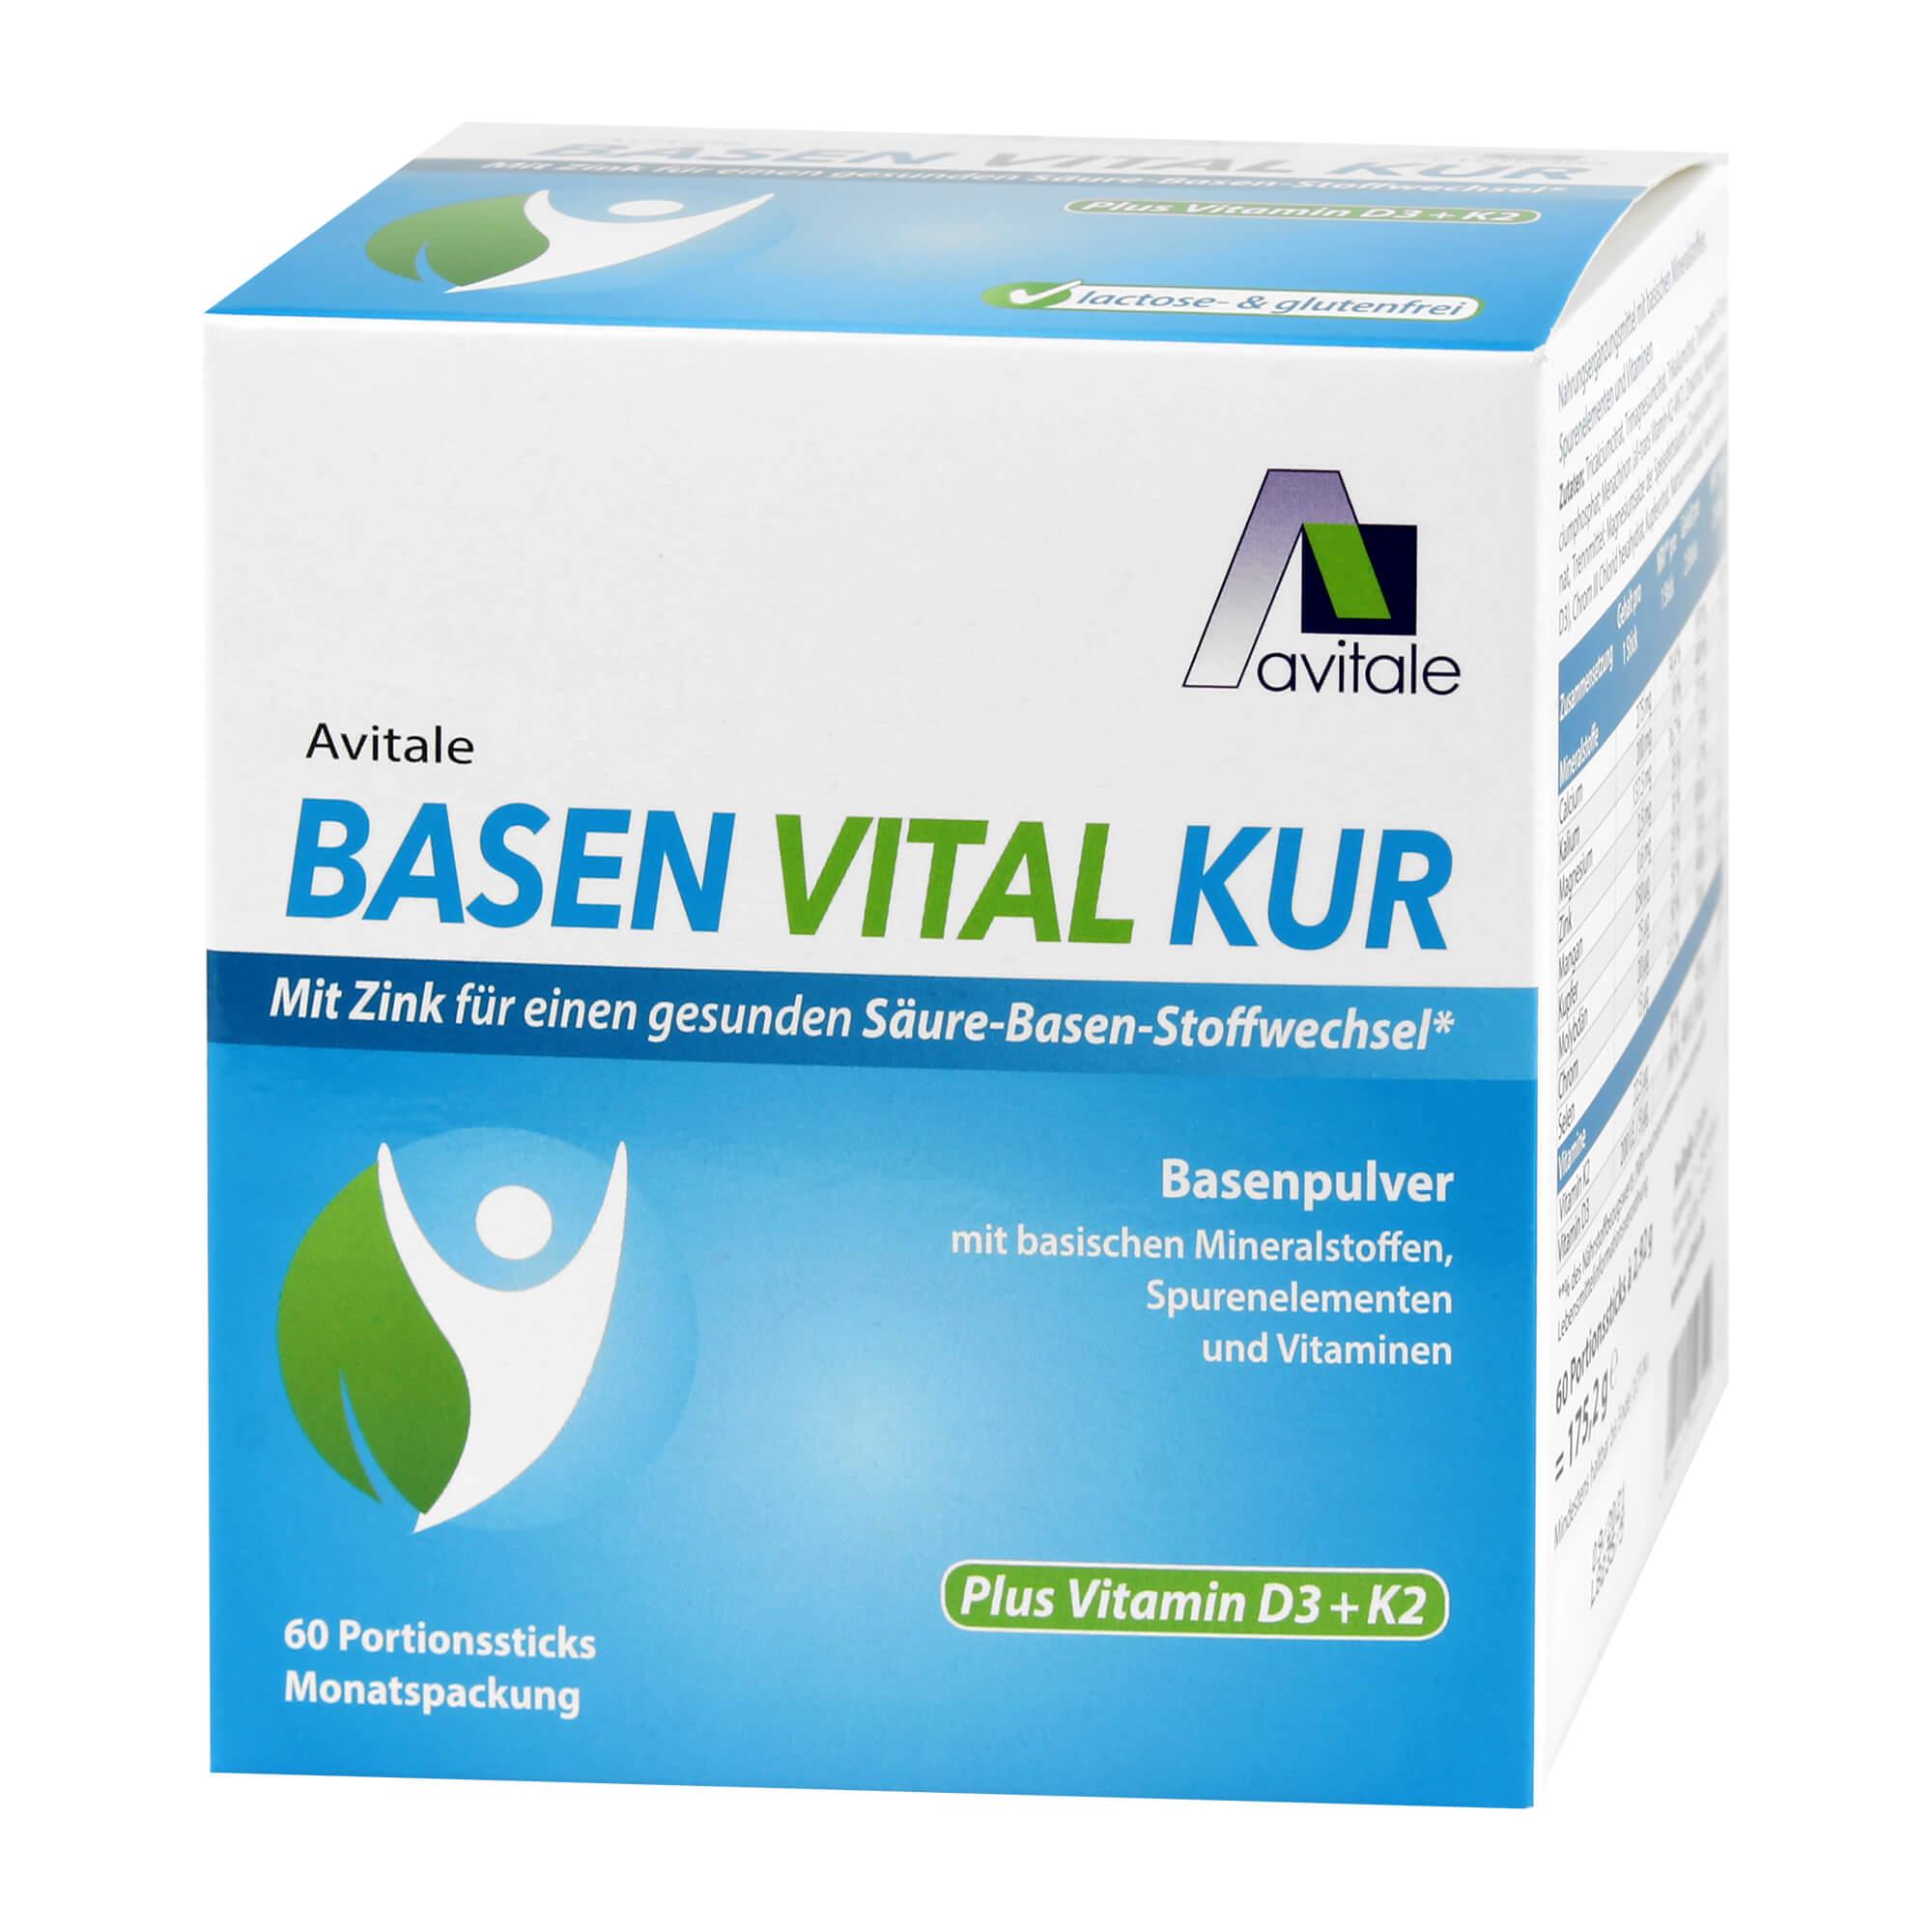 Basen Vital Kur plus Vitamin D3 + K2 Pulver